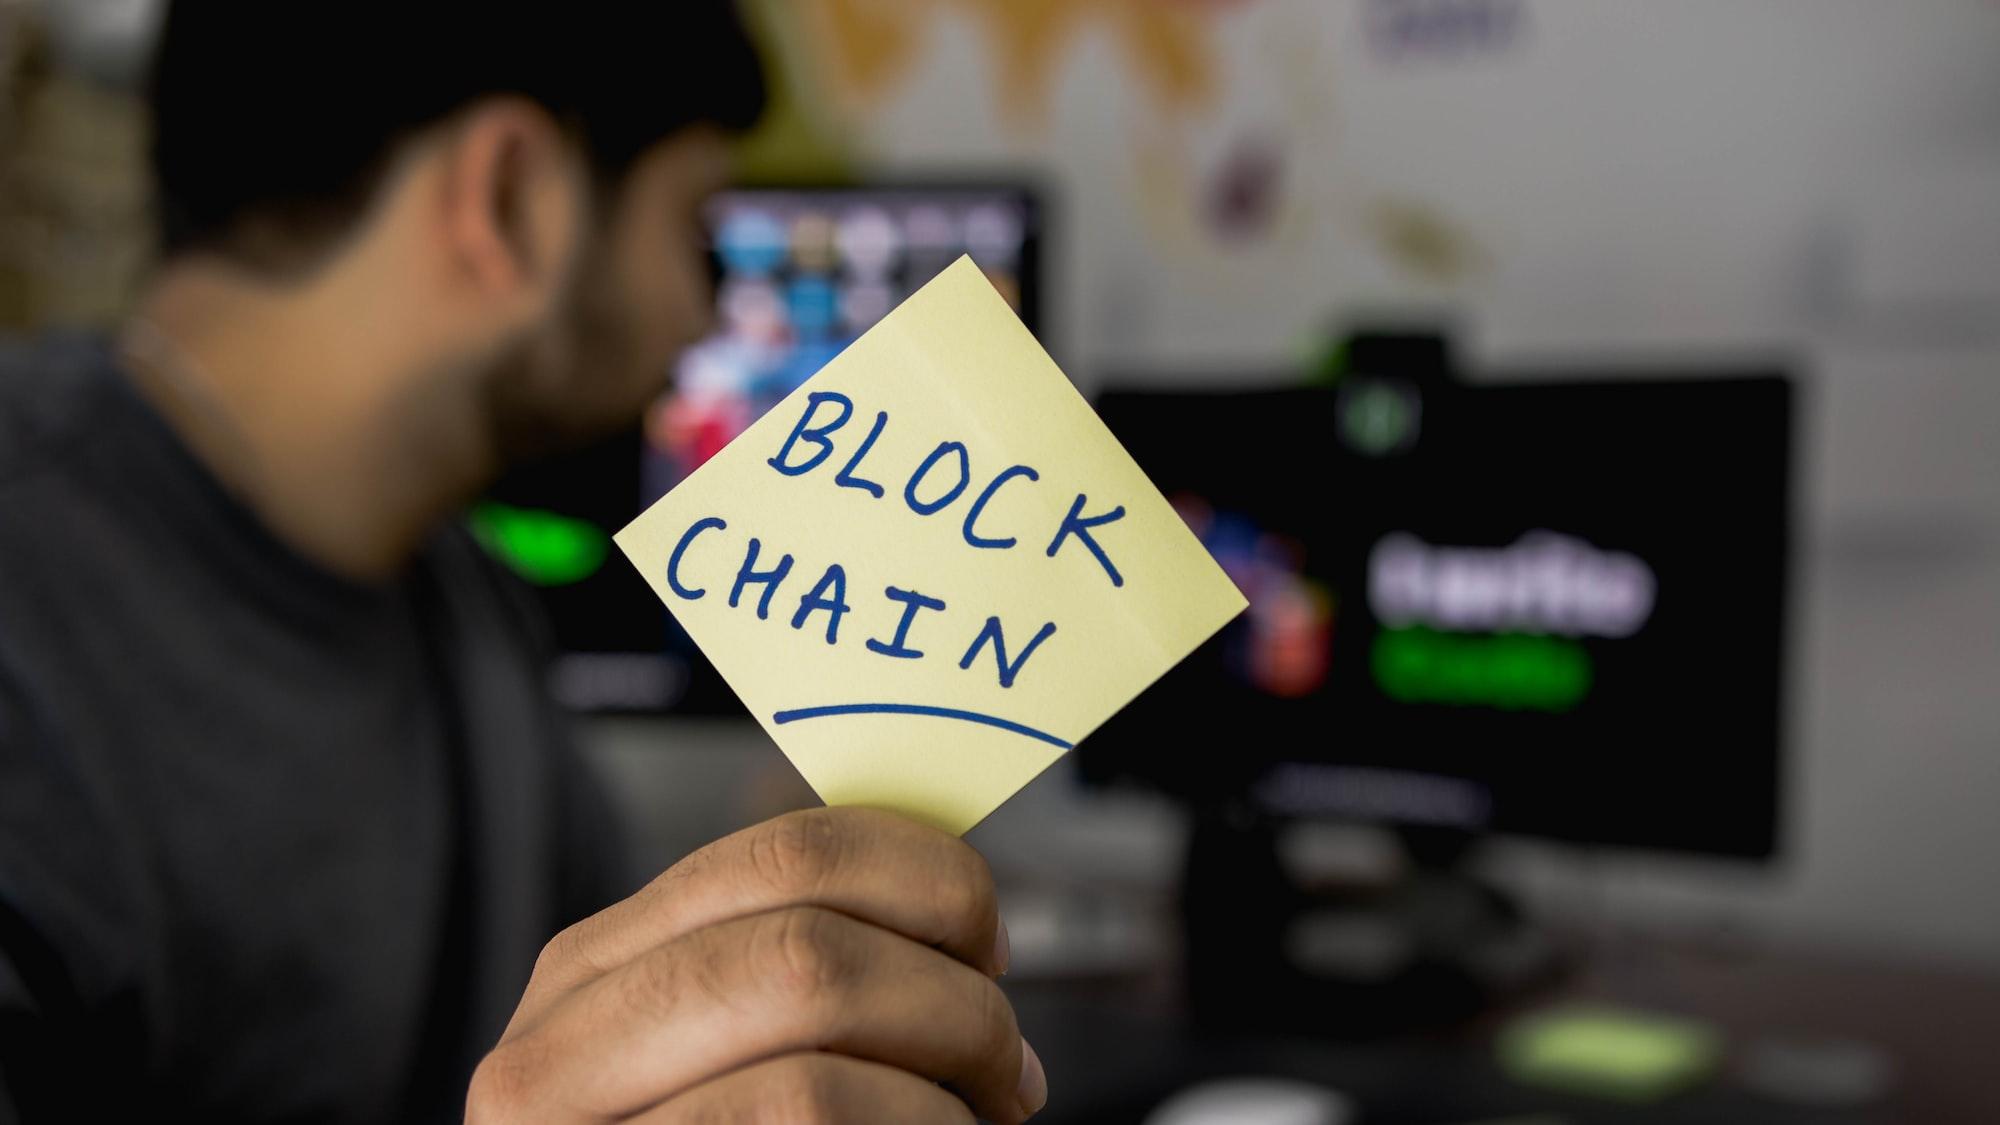 BLOCKCHAIN TECHNOLOGY, IT'S A NEW JOURNEY.